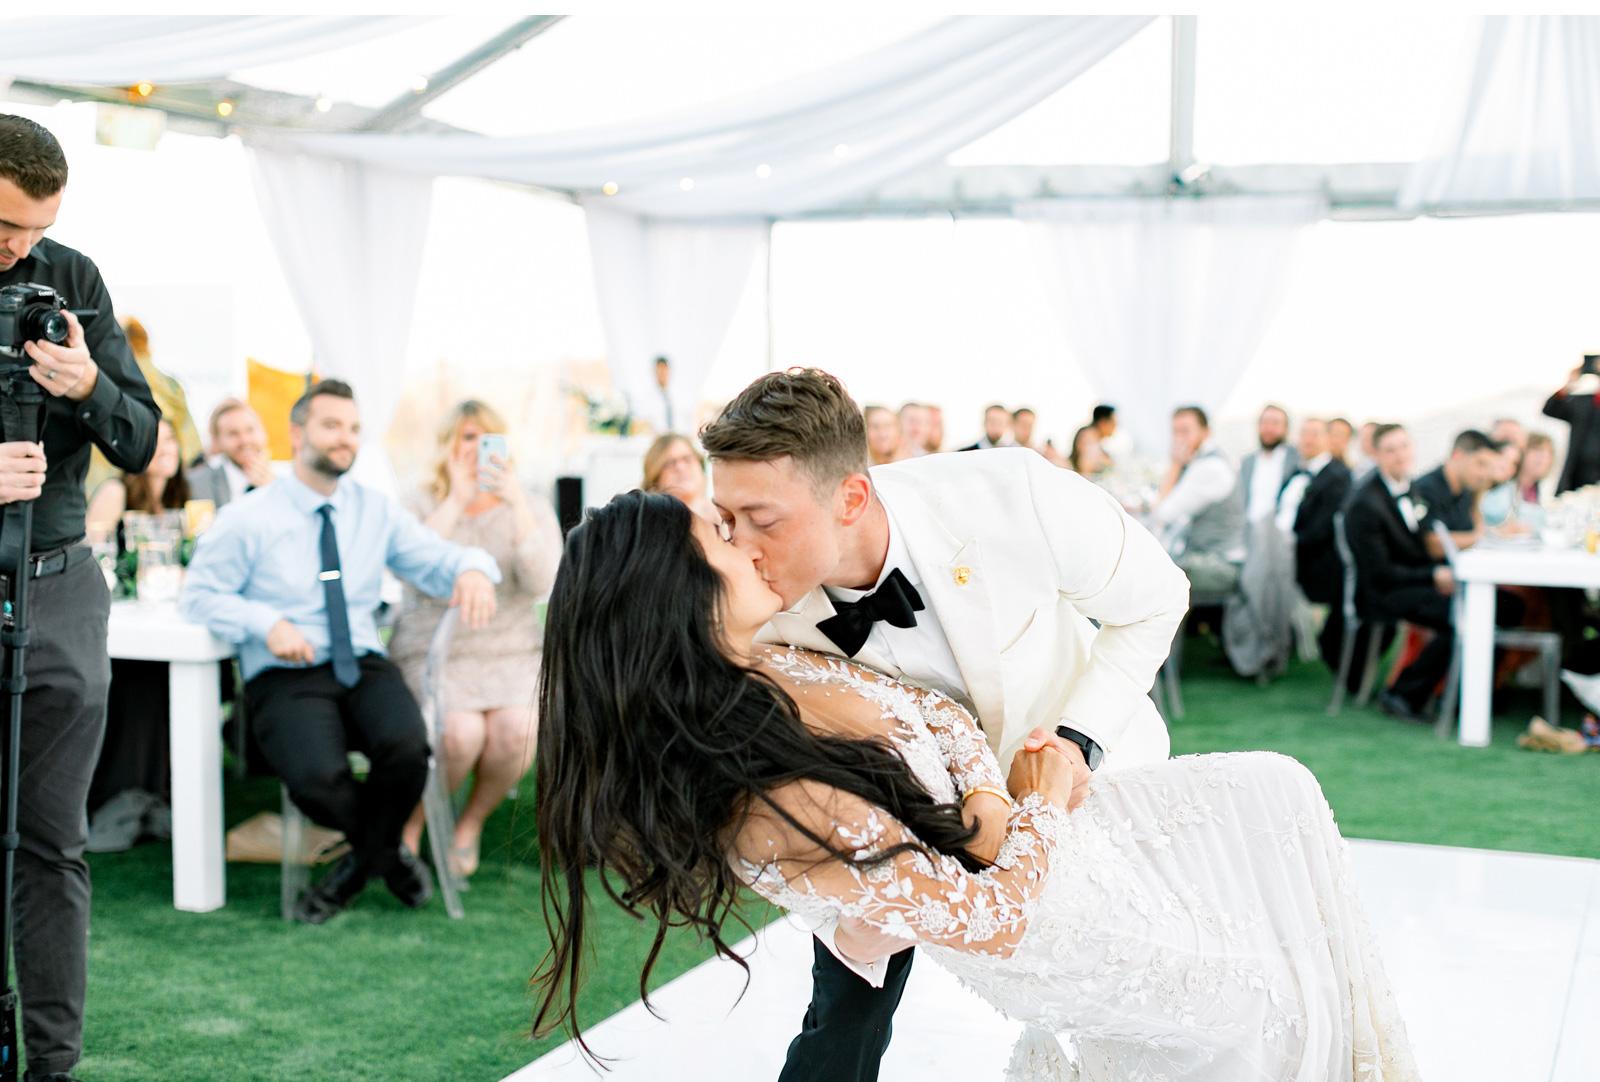 West-Coast-Wedding-Photographer-Style-Me-Pretty-Malibu-Weddings-Fine-Art-Wedding-Photography-Natalie-Schutt-Photography_08.jpg